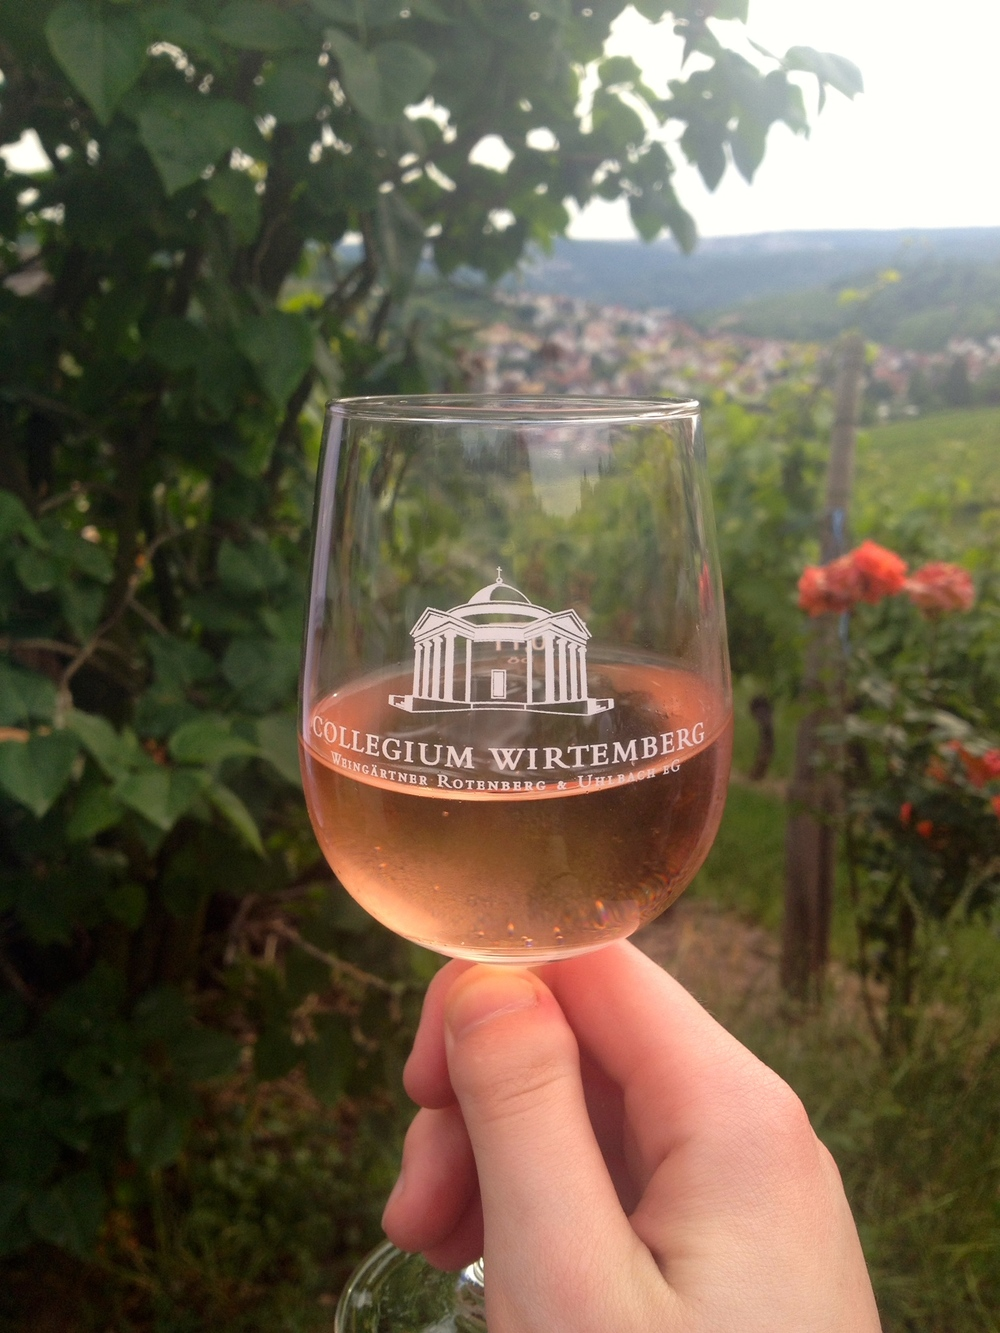 Wine tasting on the Collegium Wirtemberg wine walk last year